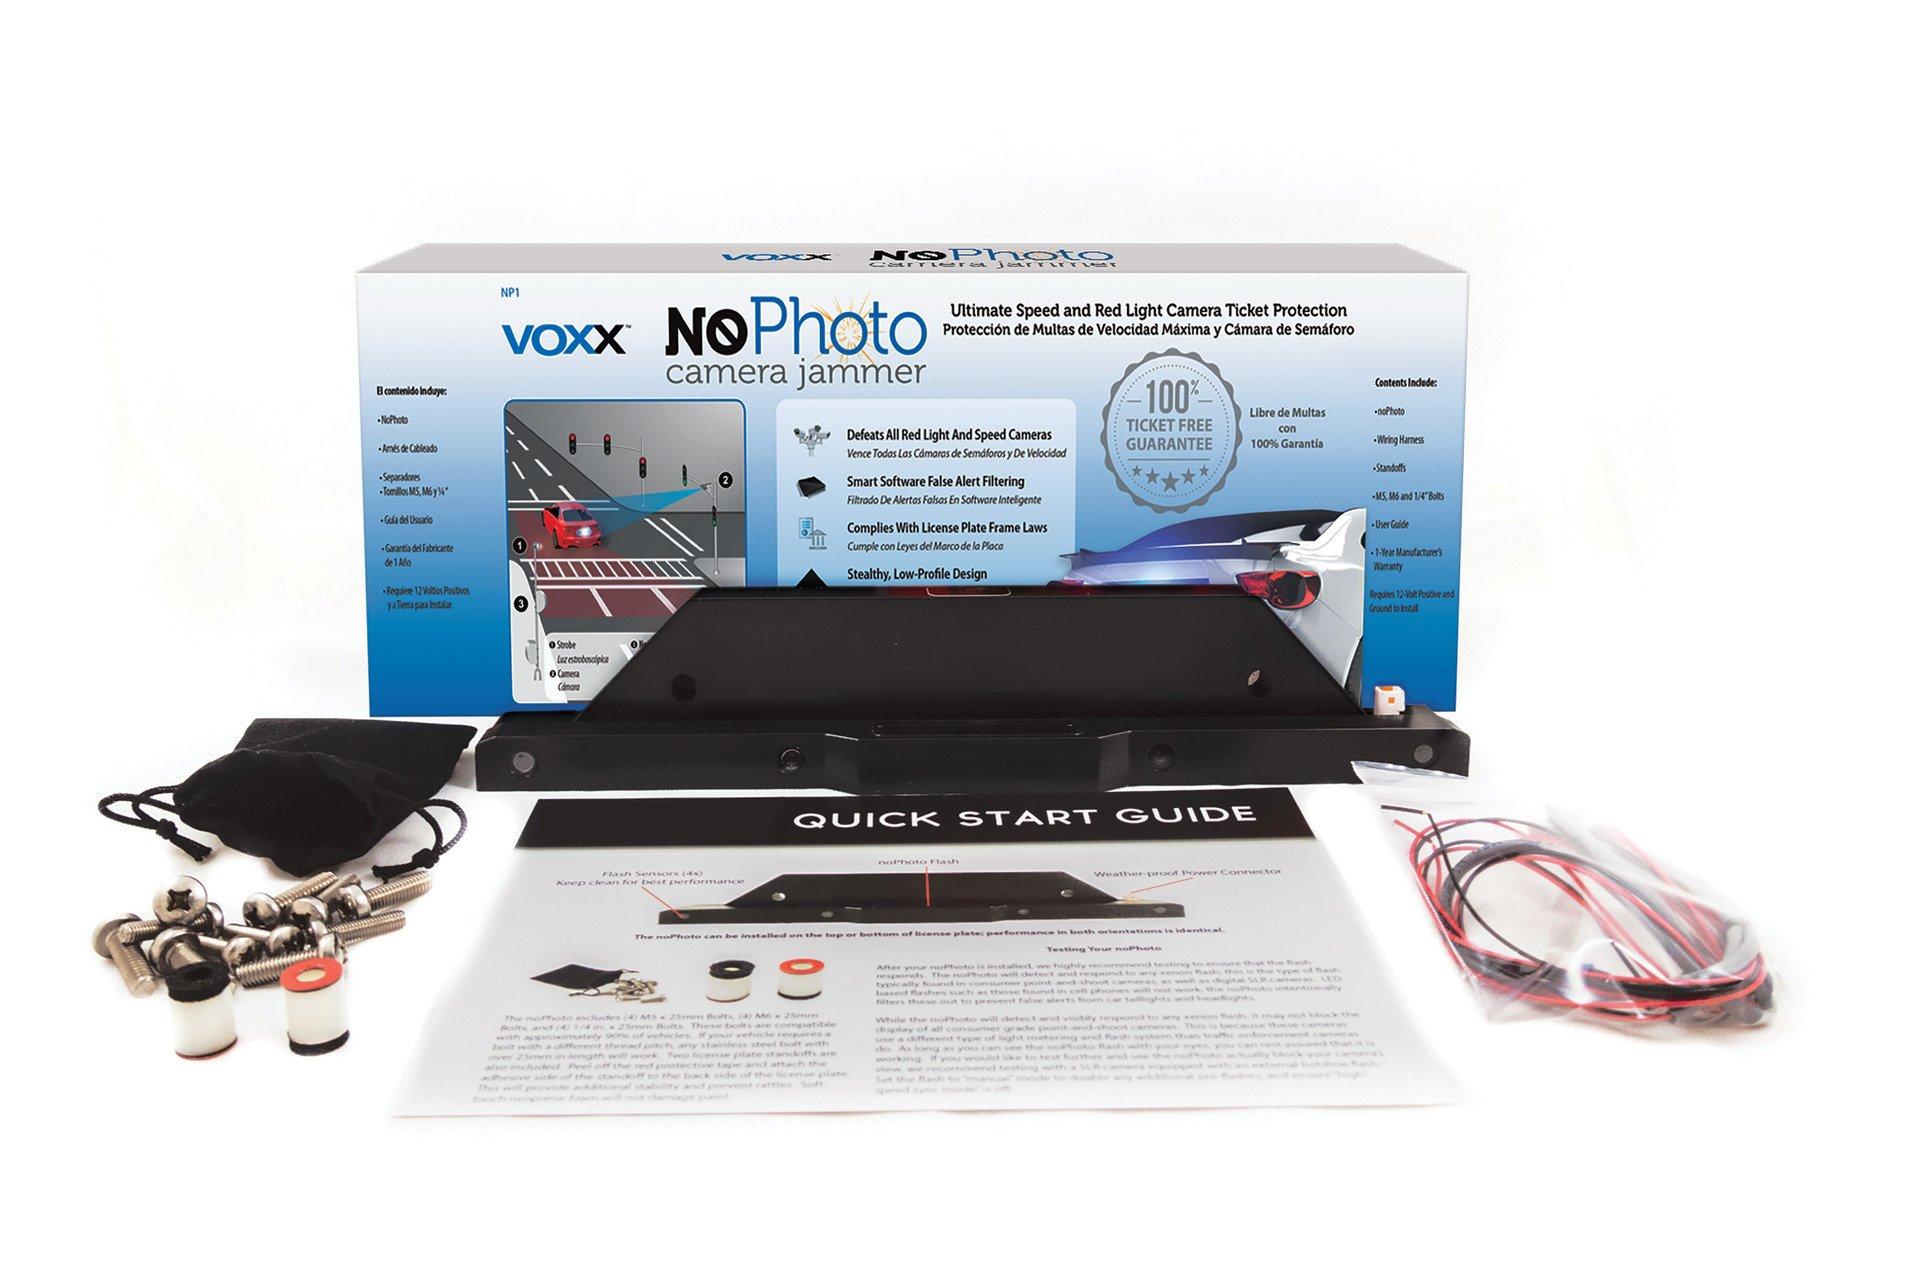 Voxx NoPhoto Camera Jammer - No More Speed Camera Tickets